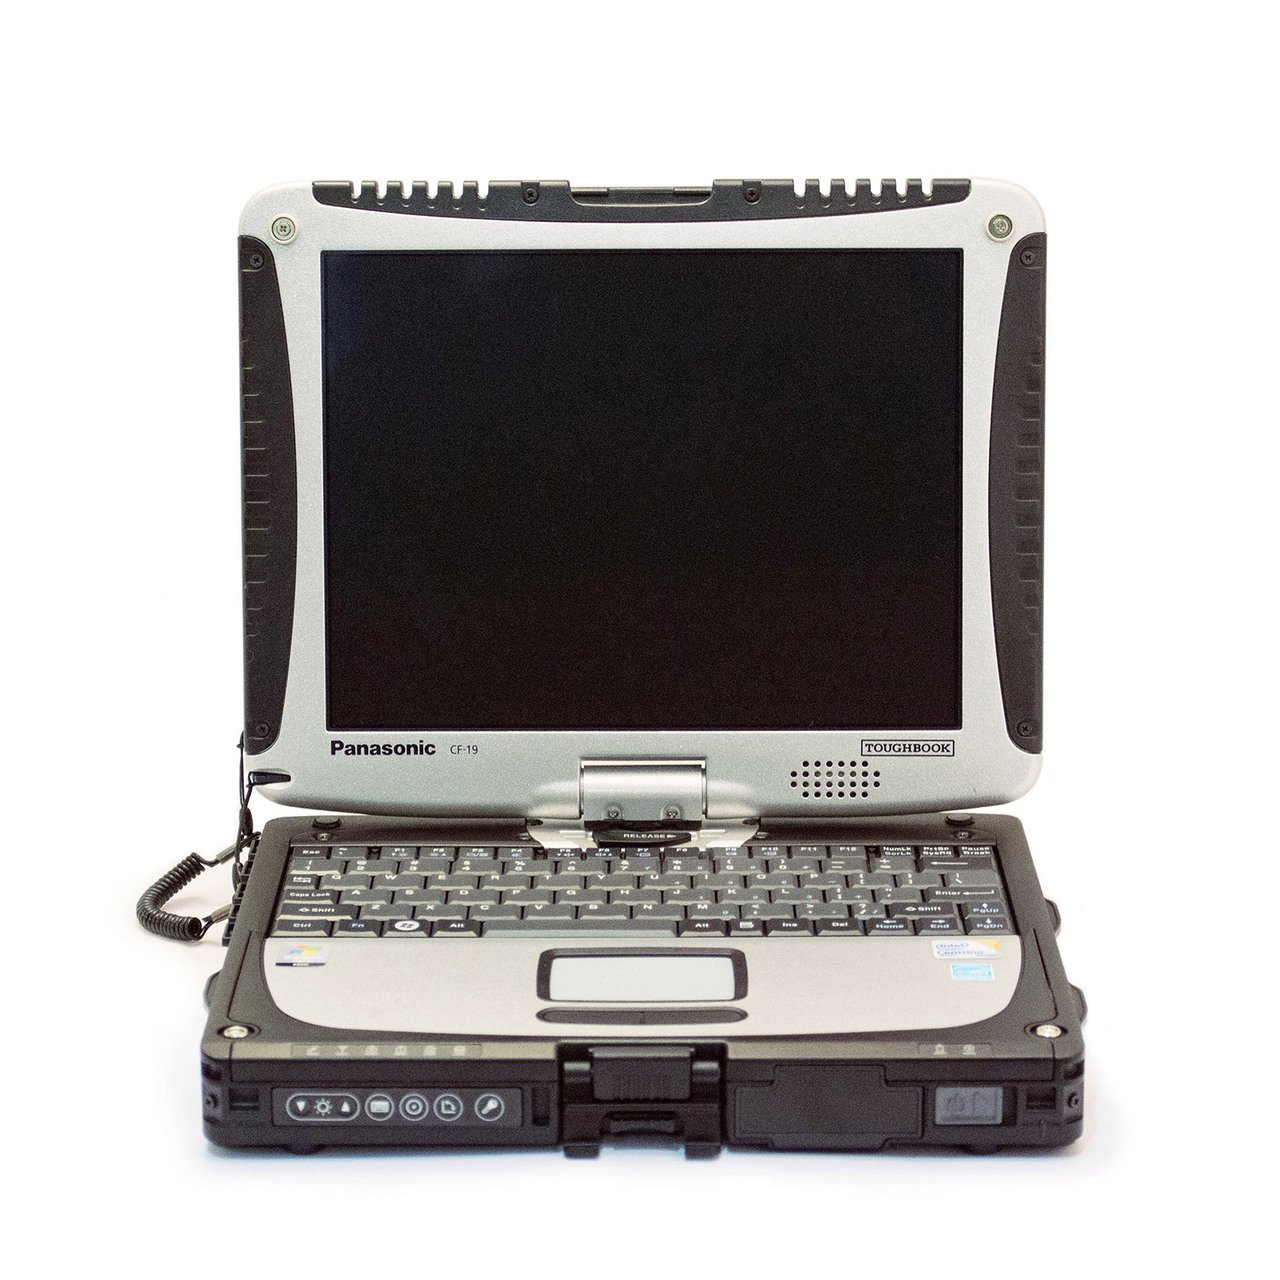 "Laptop Panasonic Toughbook CF-19 MK7, Intel Core i5 3340M 2.7 GHz, WI-FI, Bluetooth, Display 10,4"" 1024 by 768 Touchscreen, 4 GB DDR3; 320 GB HDD SATA, Second Hand - imaginea 1"